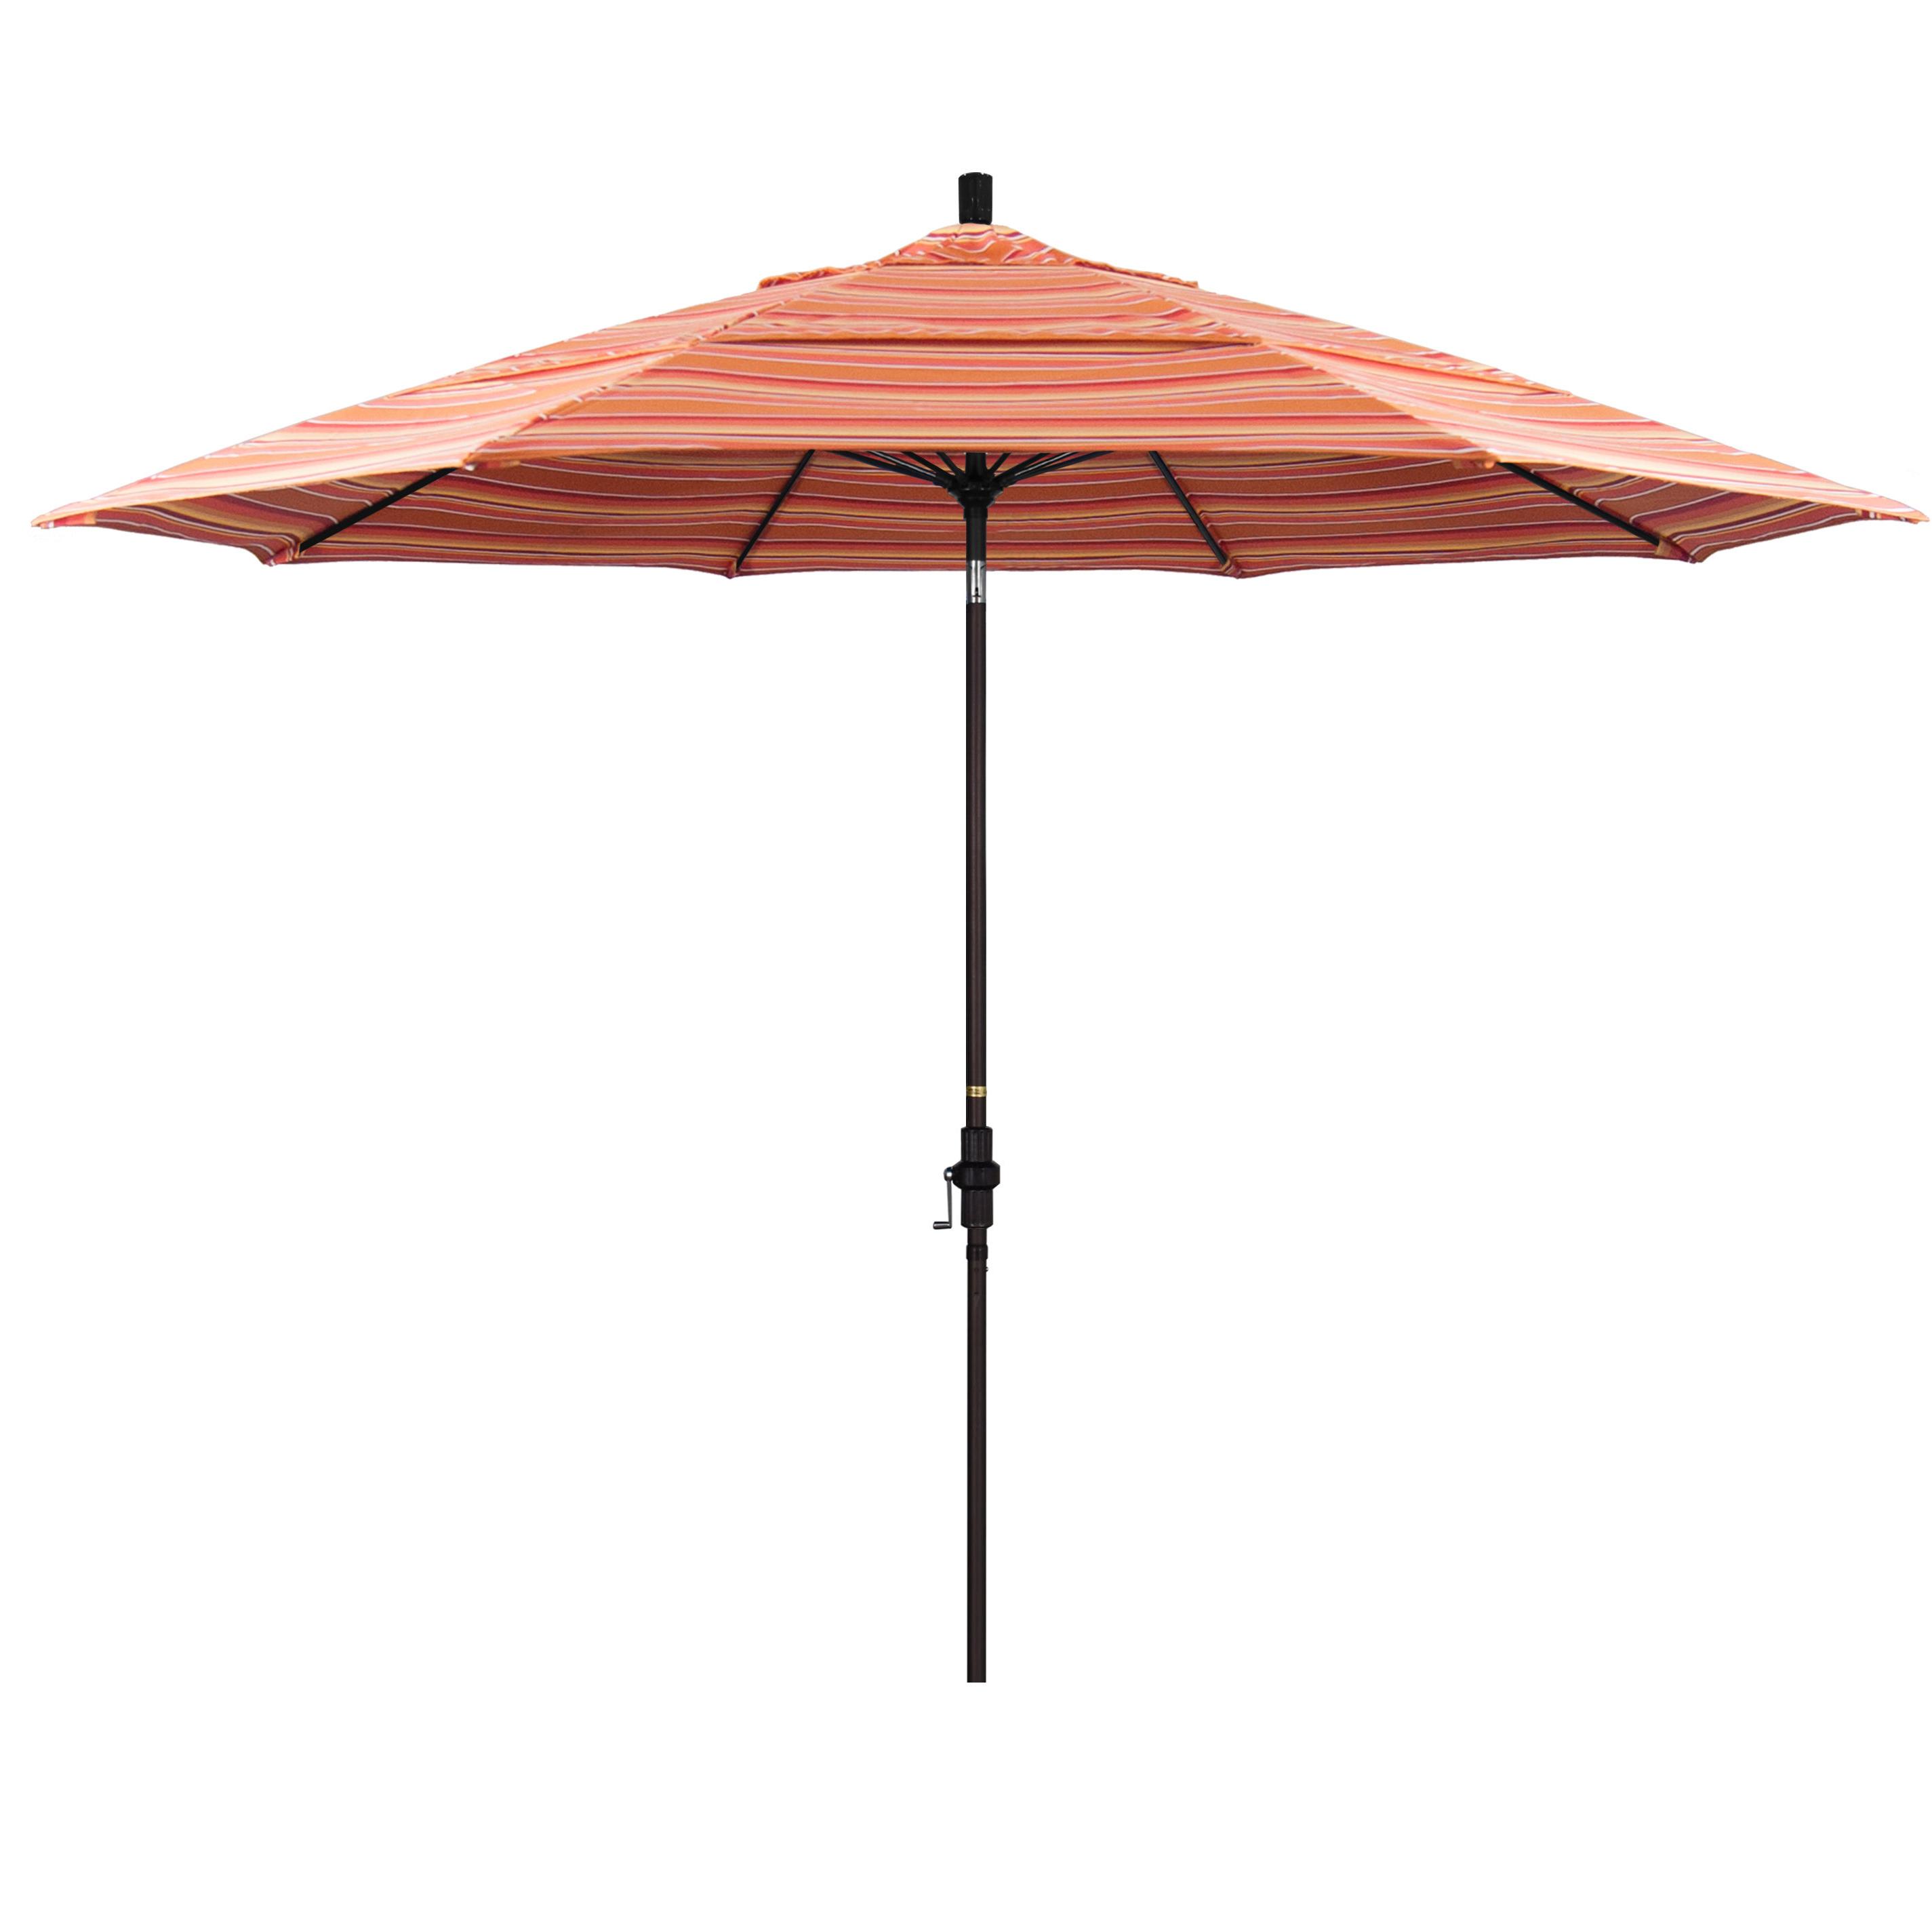 Muldoon 11' Market Sunbrella Umbrella Throughout Popular Featherste Market Umbrellas (View 14 of 20)